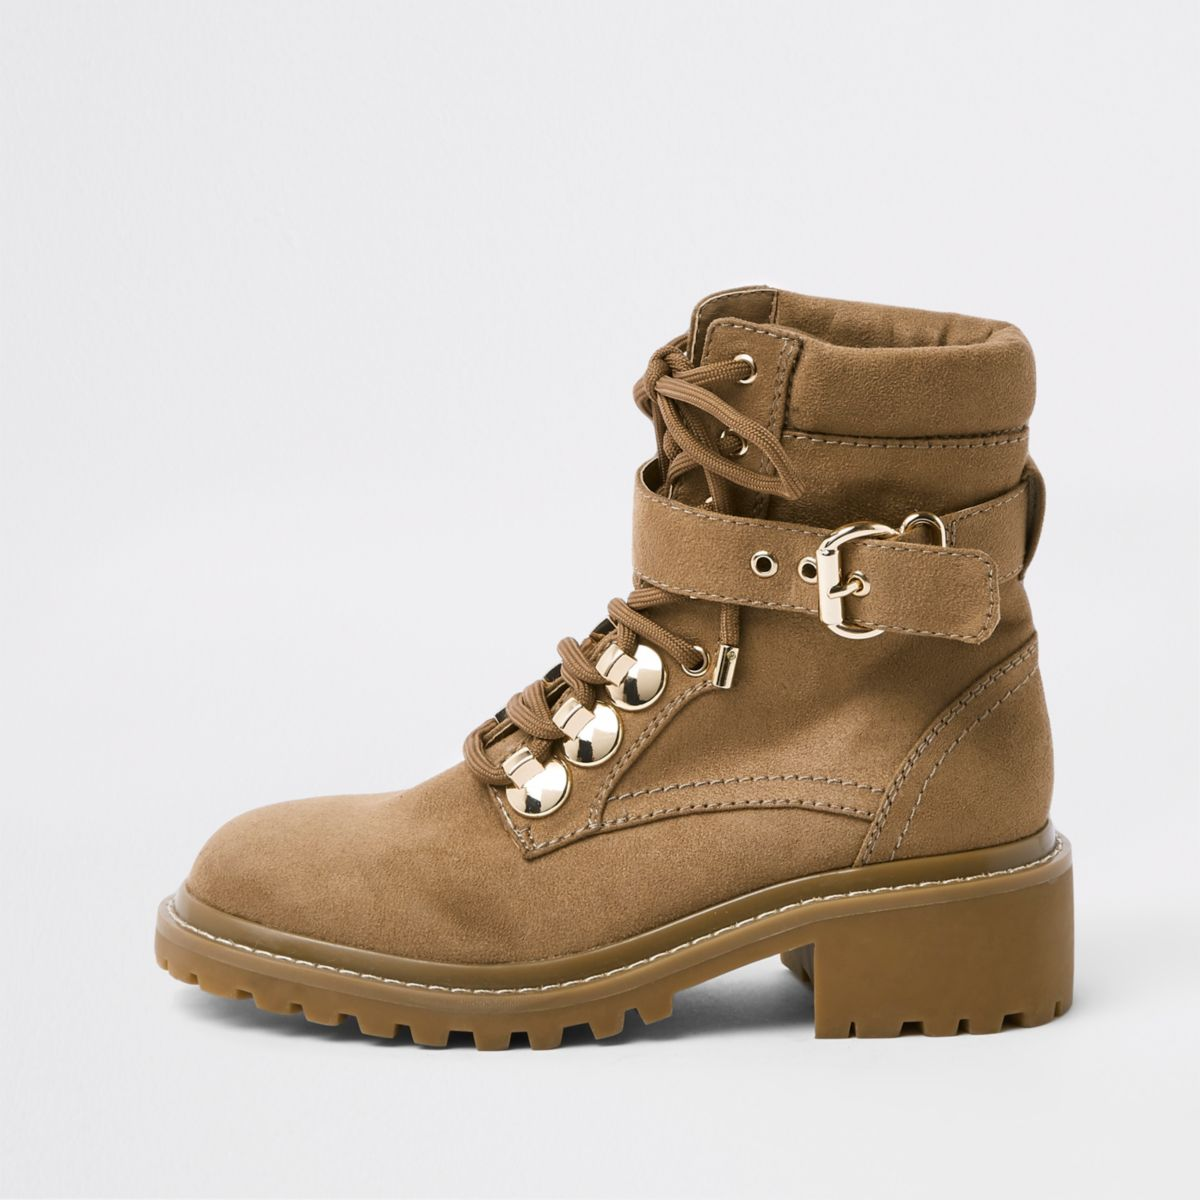 Beige faux suede lace-up boots